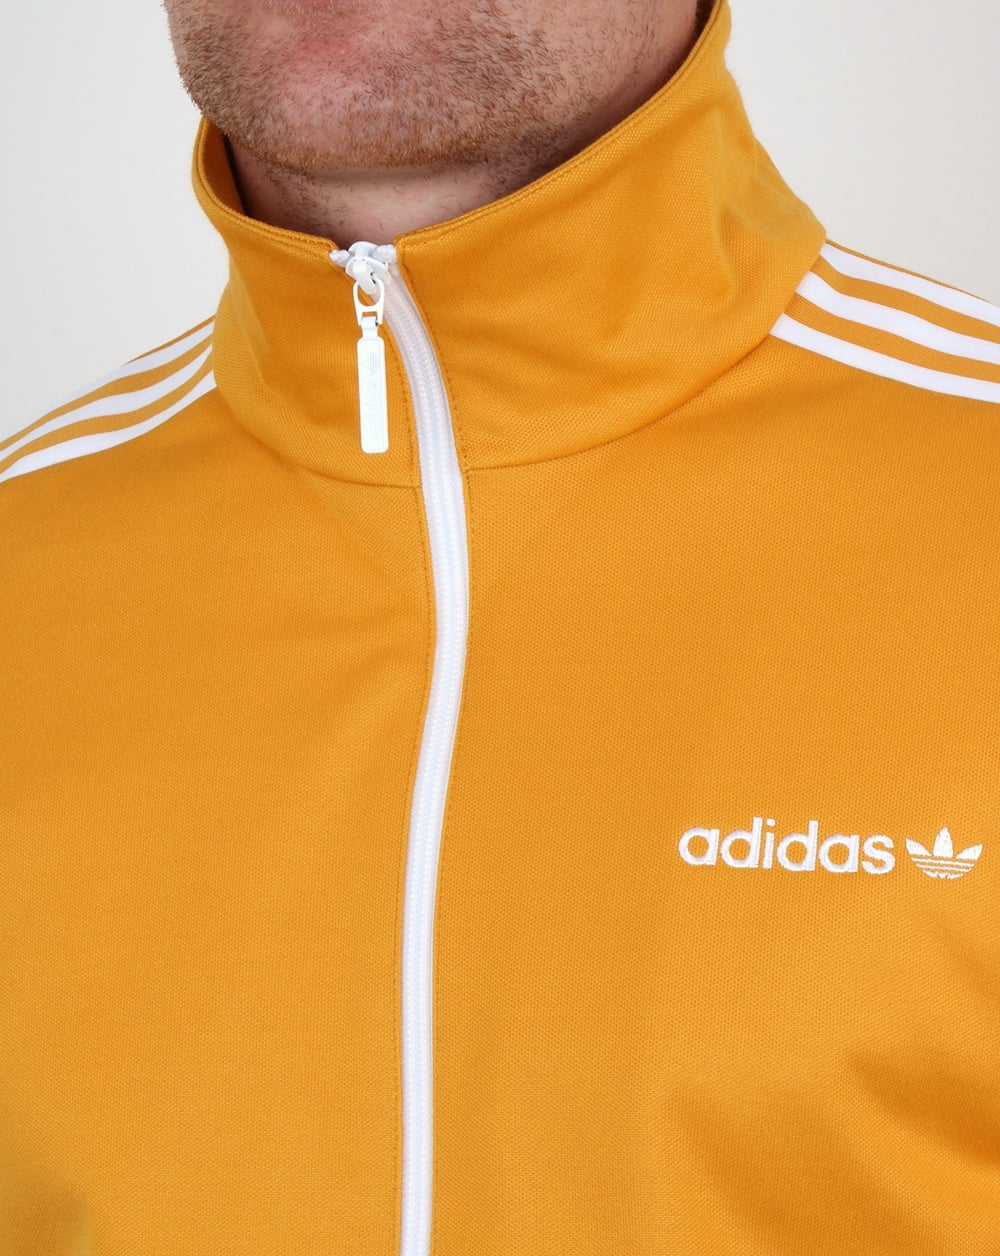 e4a91a67aed4 Adidas Originals Beckenbauer Track Top Old Skool Yellow